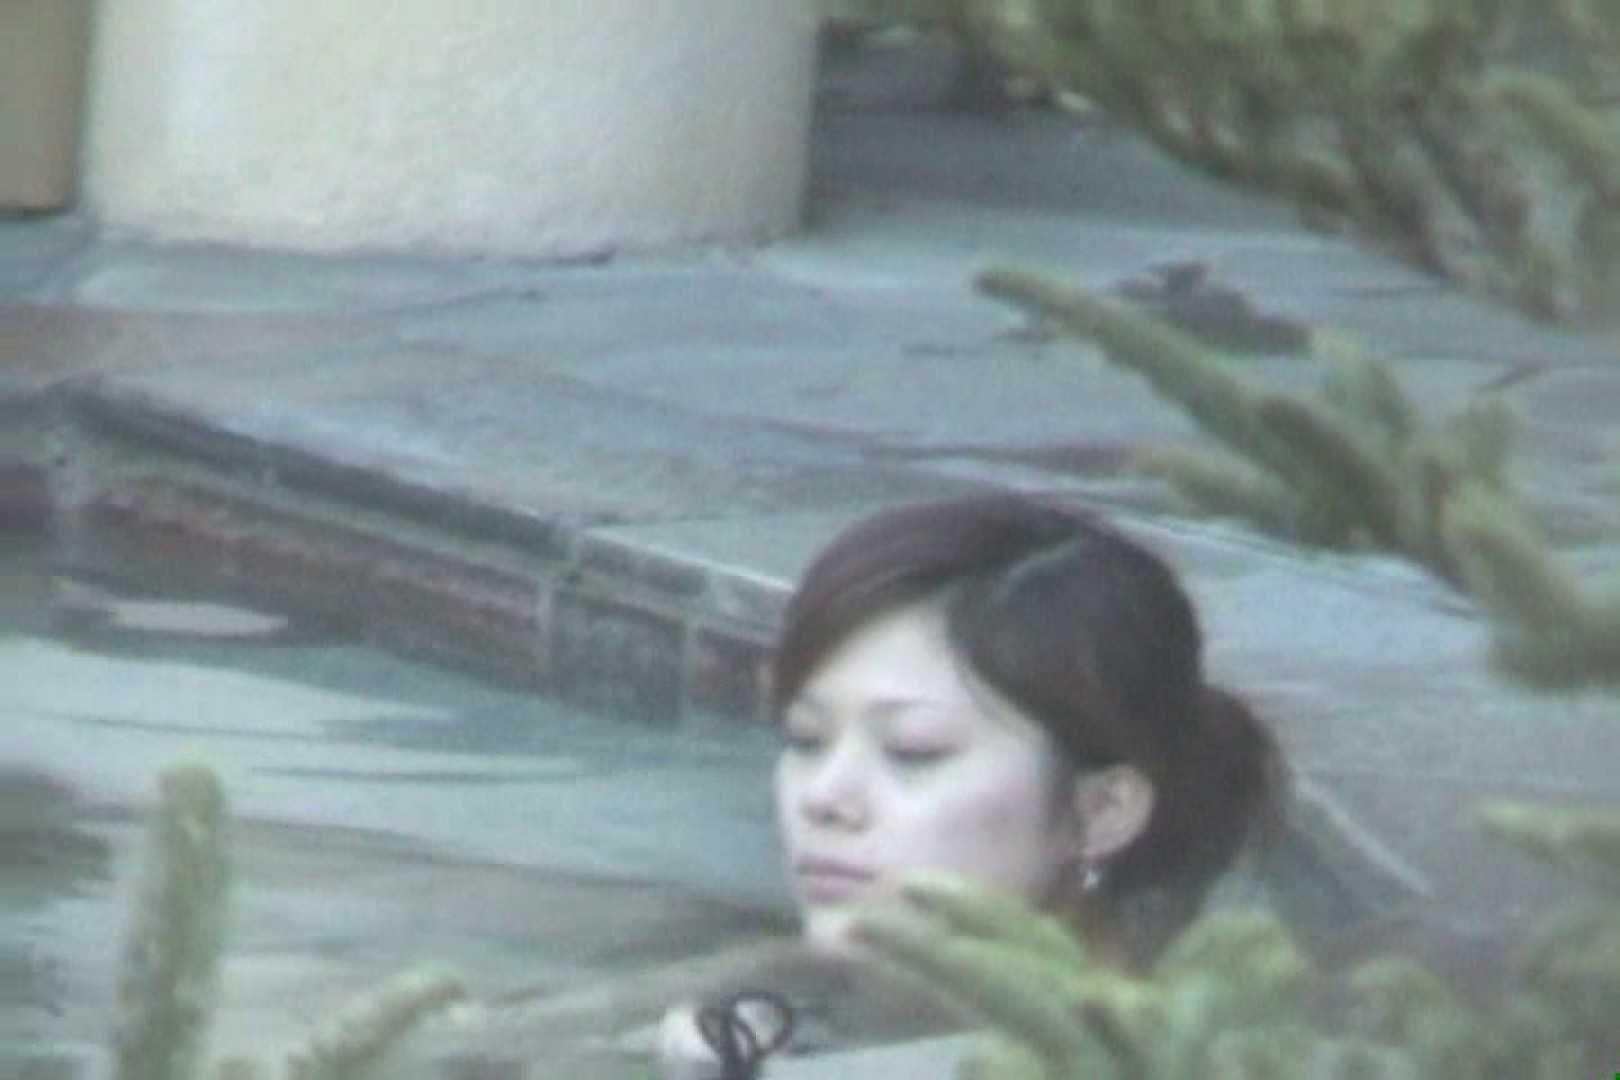 Aquaな露天風呂Vol.609 盗撮シリーズ   露天風呂編  107PIX 25